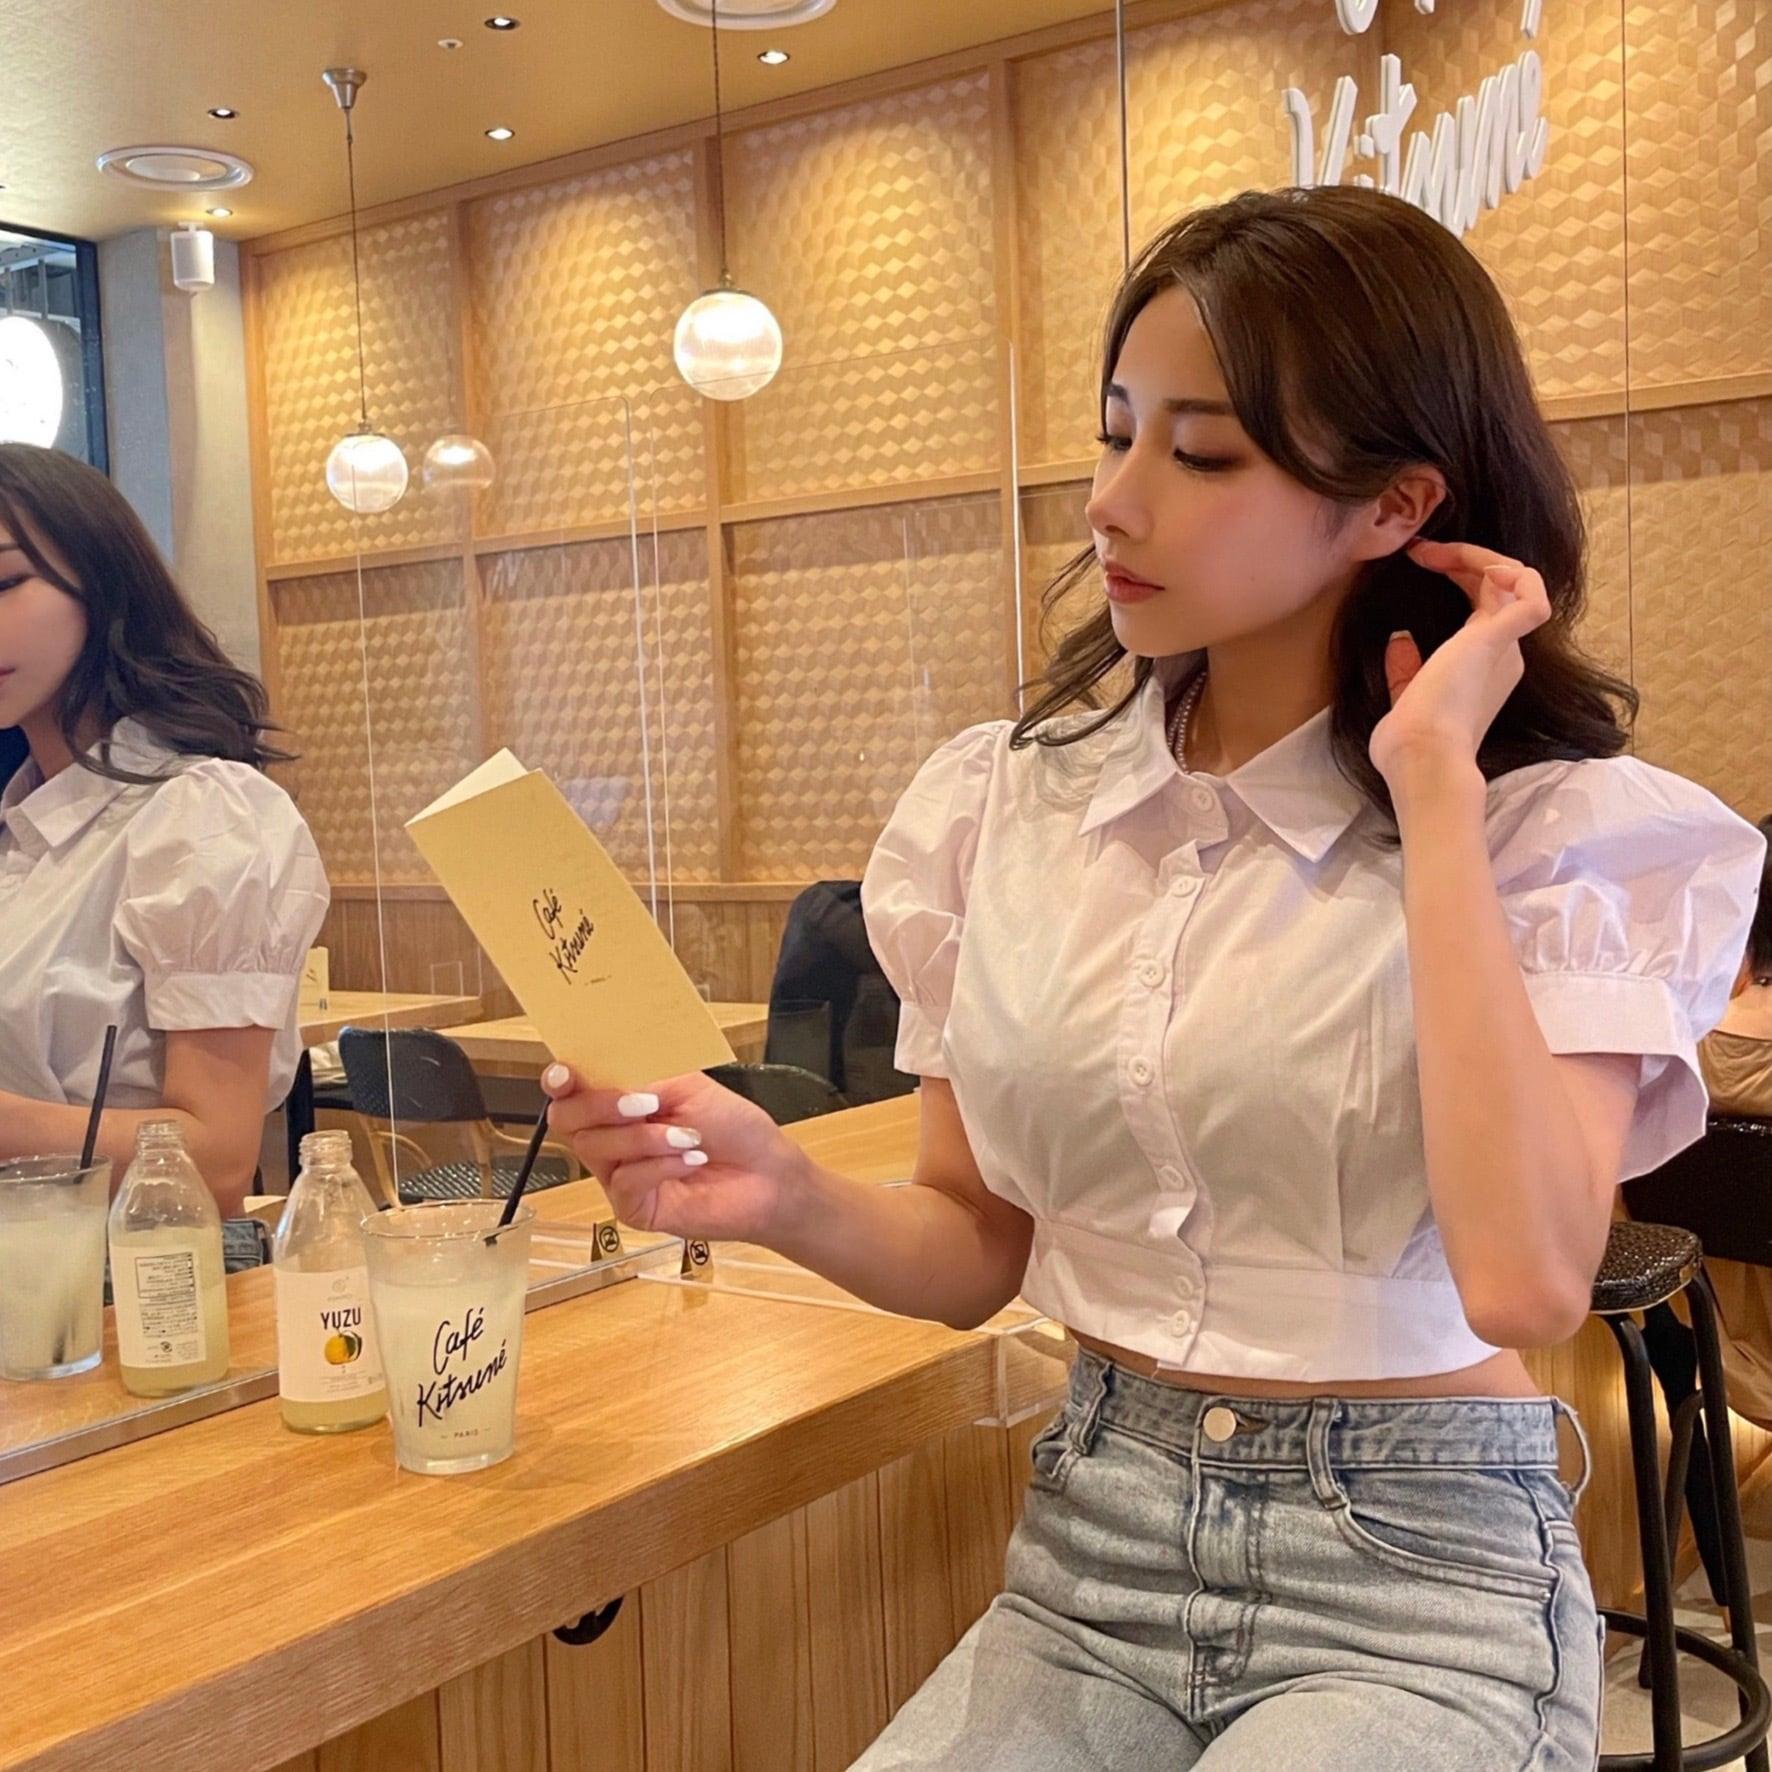 White style shirt